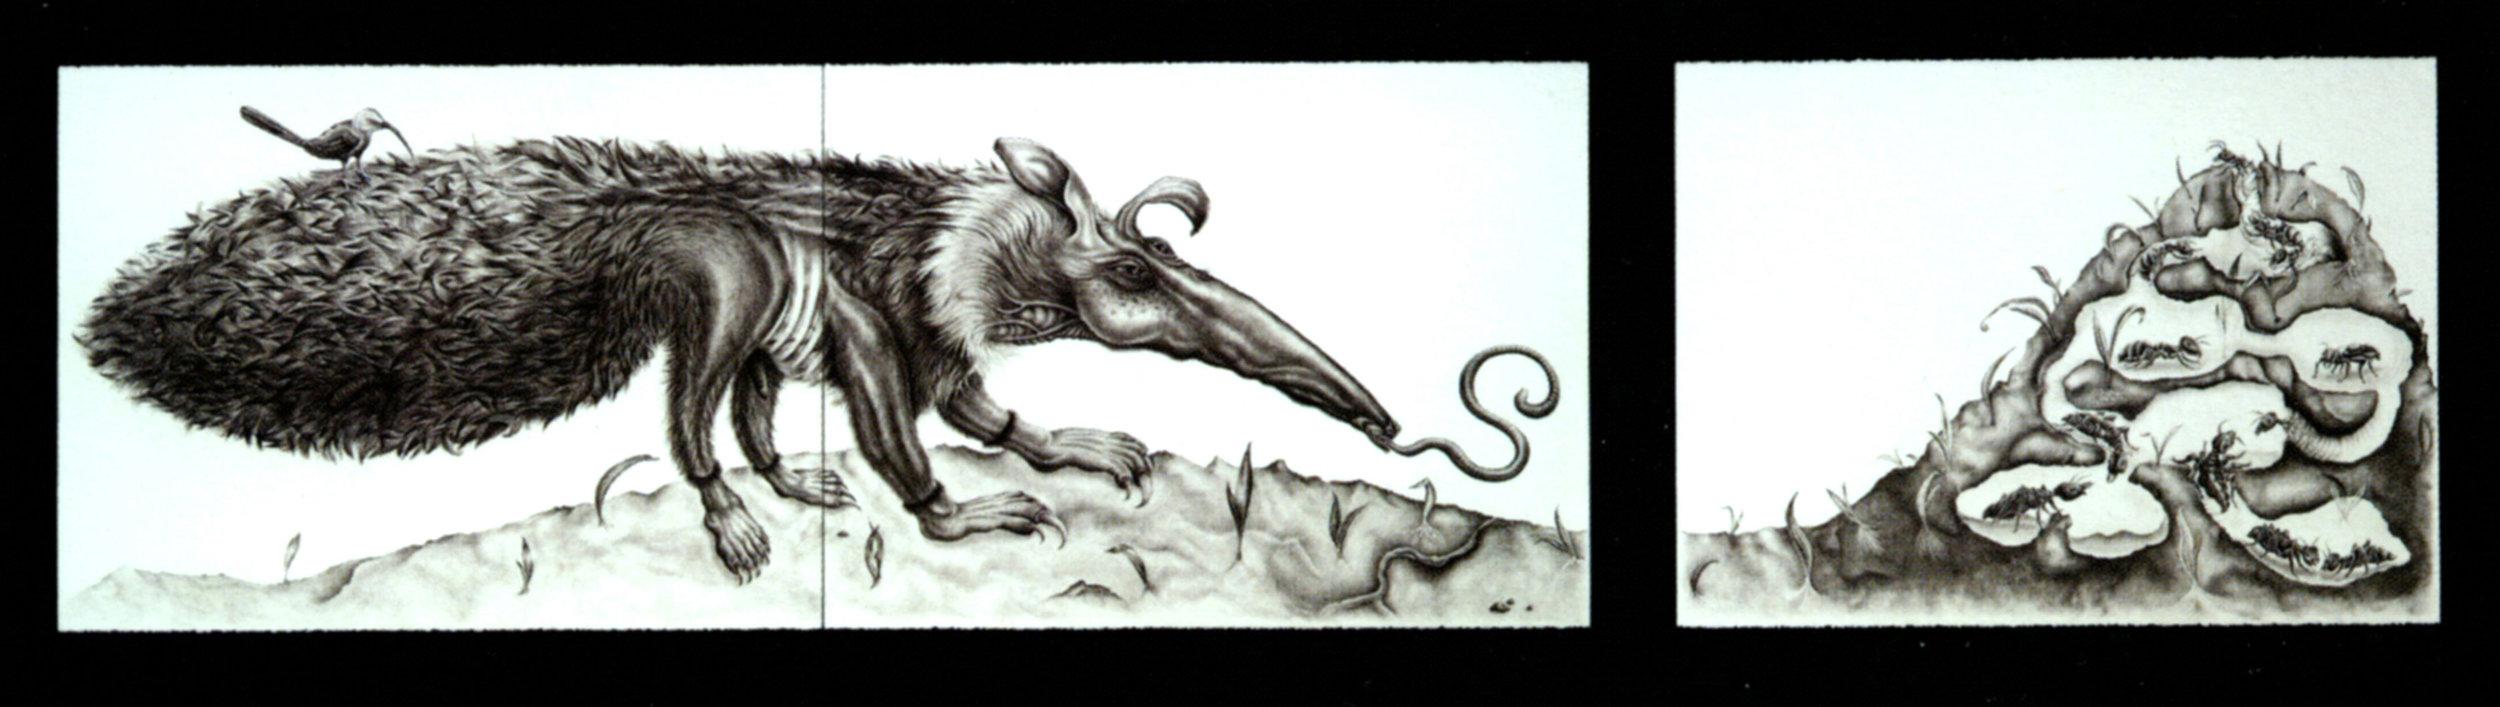 Berkus Art_081_Pg79_Plate54_Puccinelli.jpg